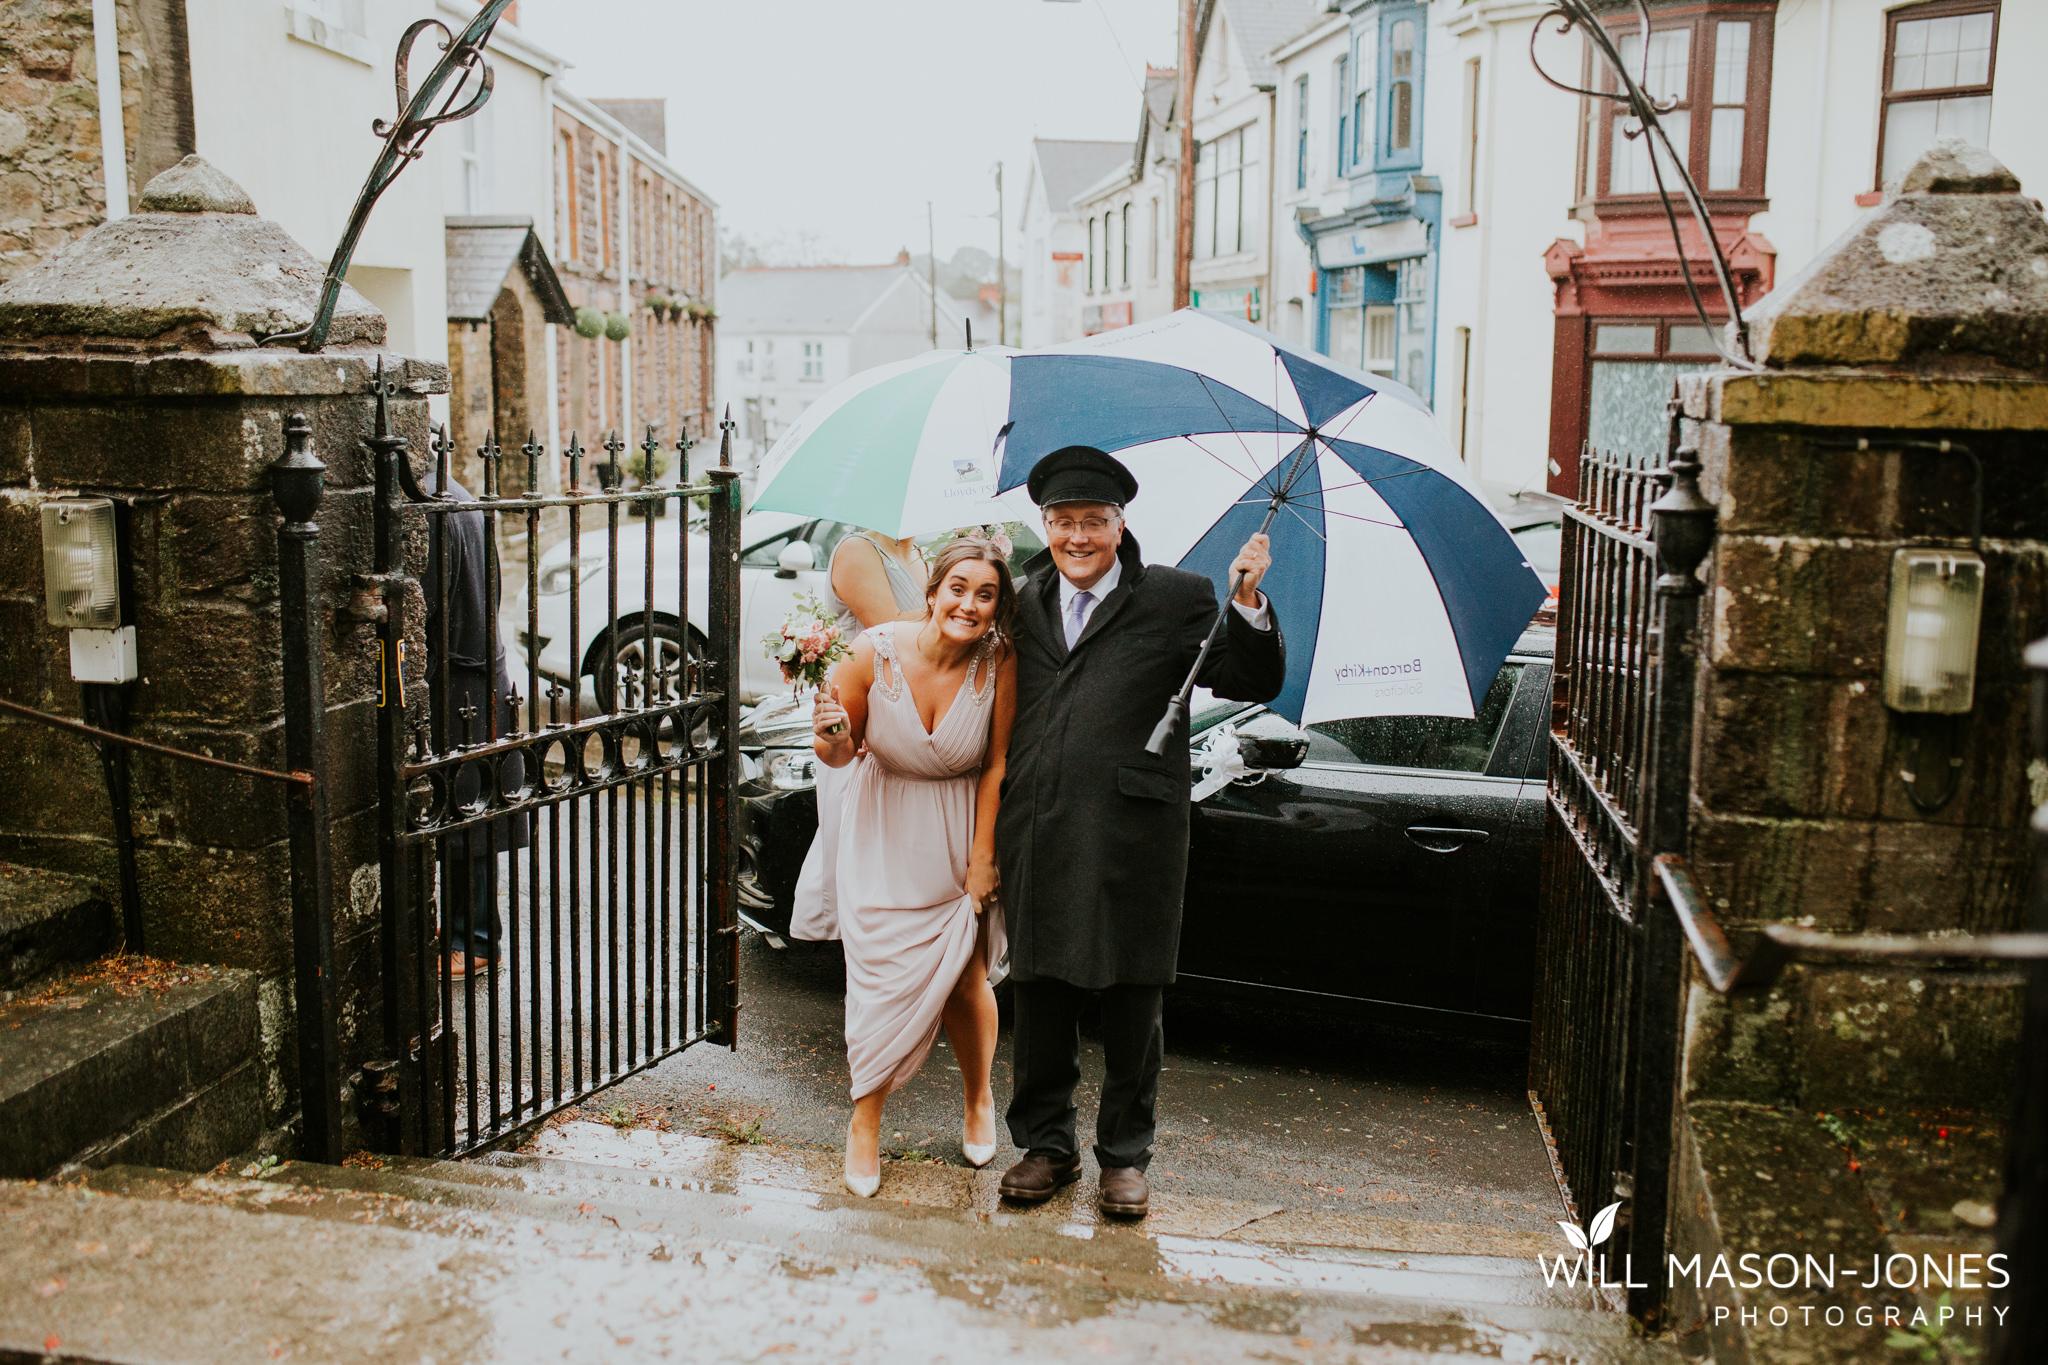 rainy-wet-llandybie-church-wedding-ceremony-swansea-photographers-5.jpg